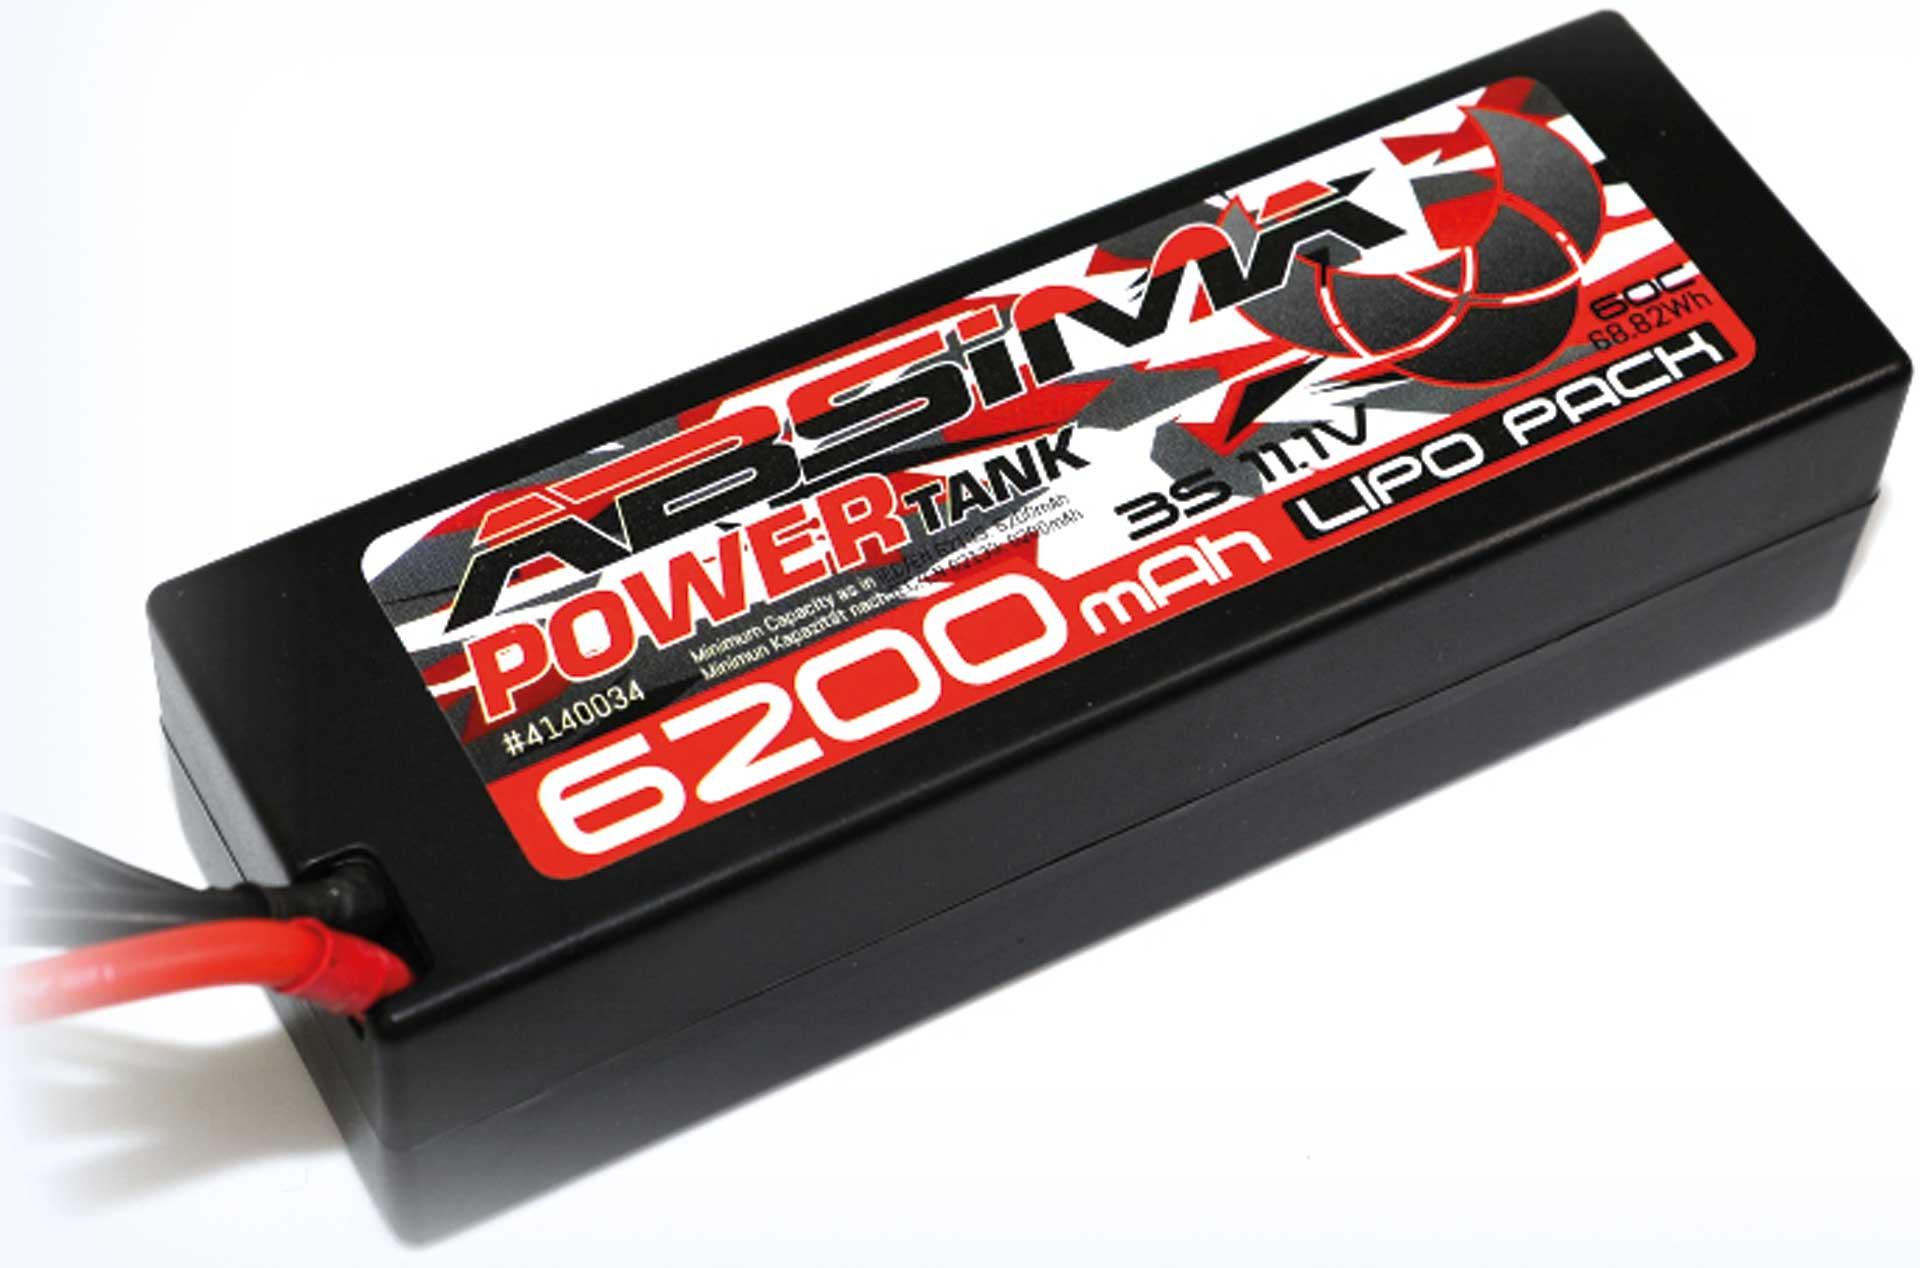 Absima Power Tank LiPo Stick Pack 11.1V-60C6200 Hardcase (XT90-Plug)